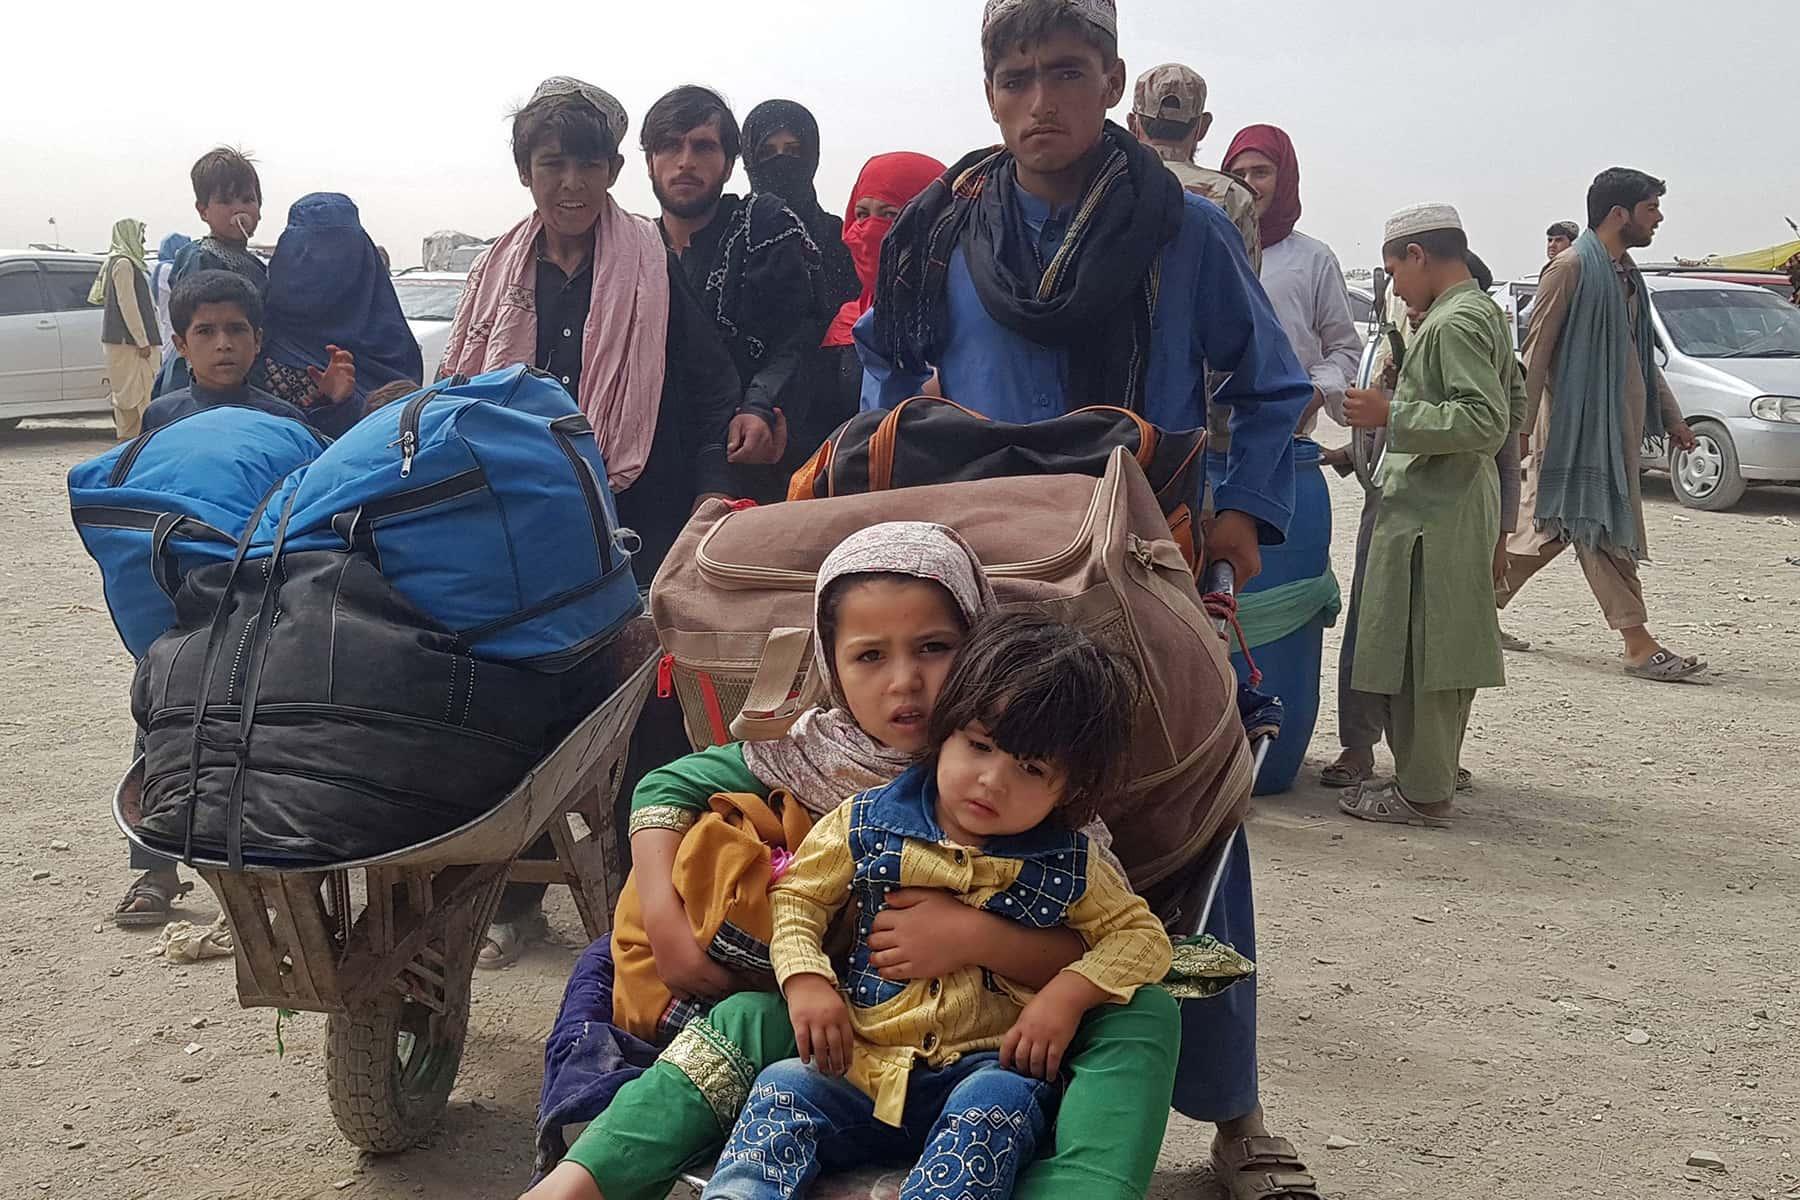 081721_AfghanResettlement_02